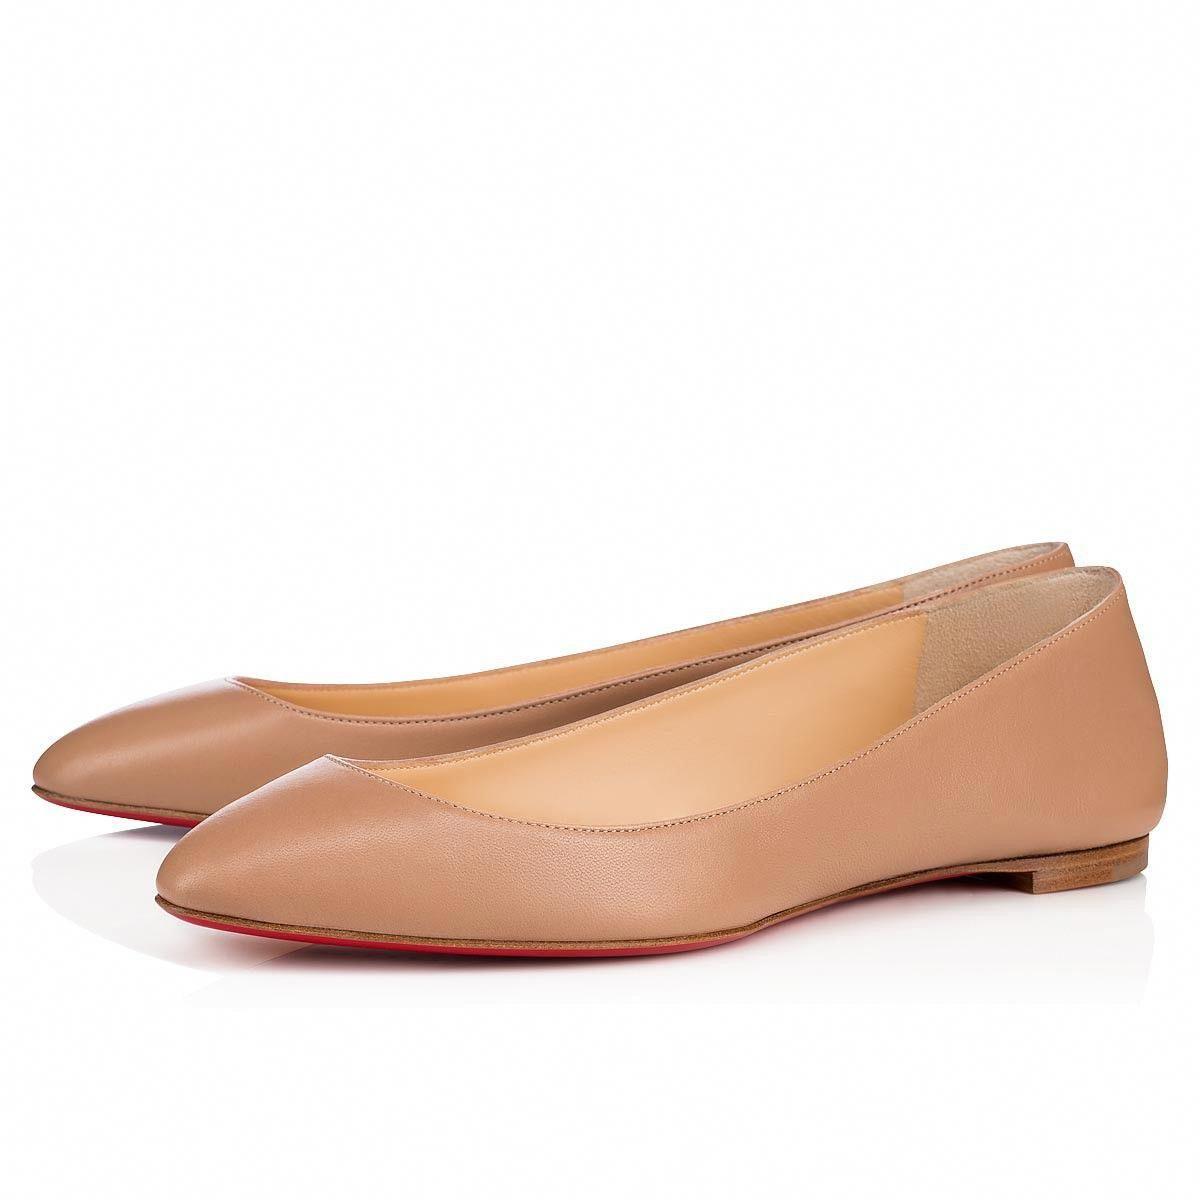 8fdd2f5c3542 Eloise Flat Nude Leather - Women Shoes - Christian Louboutin   ChristianLouboutin